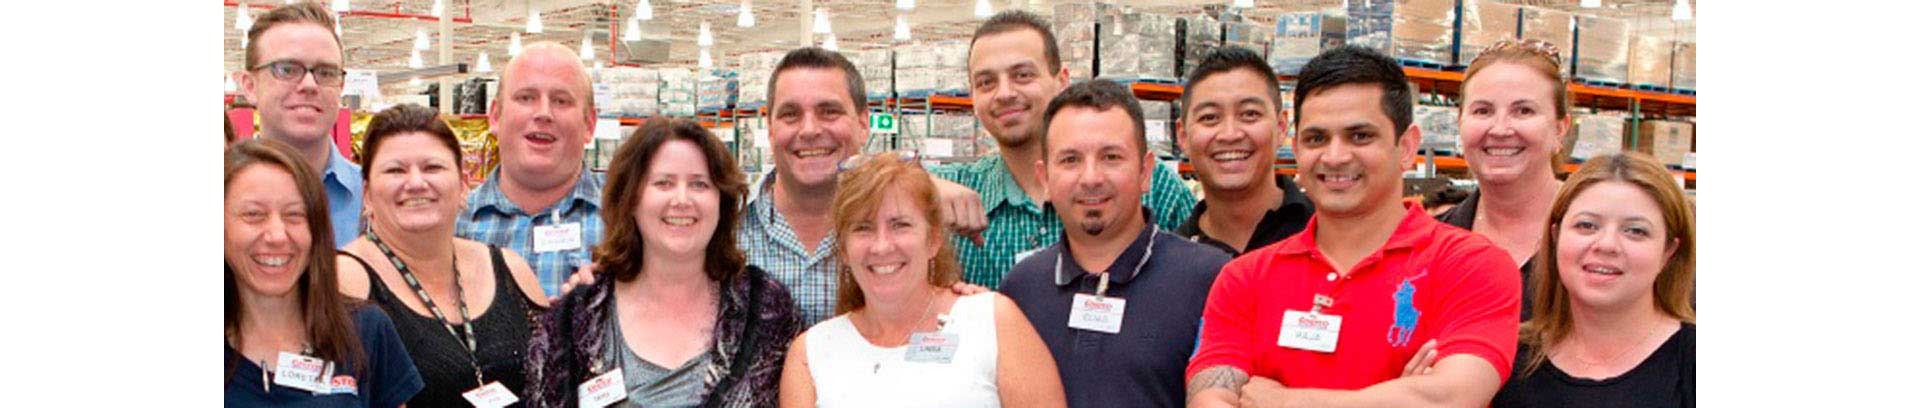 Headshots Of The Costco Team Within Costco Careers